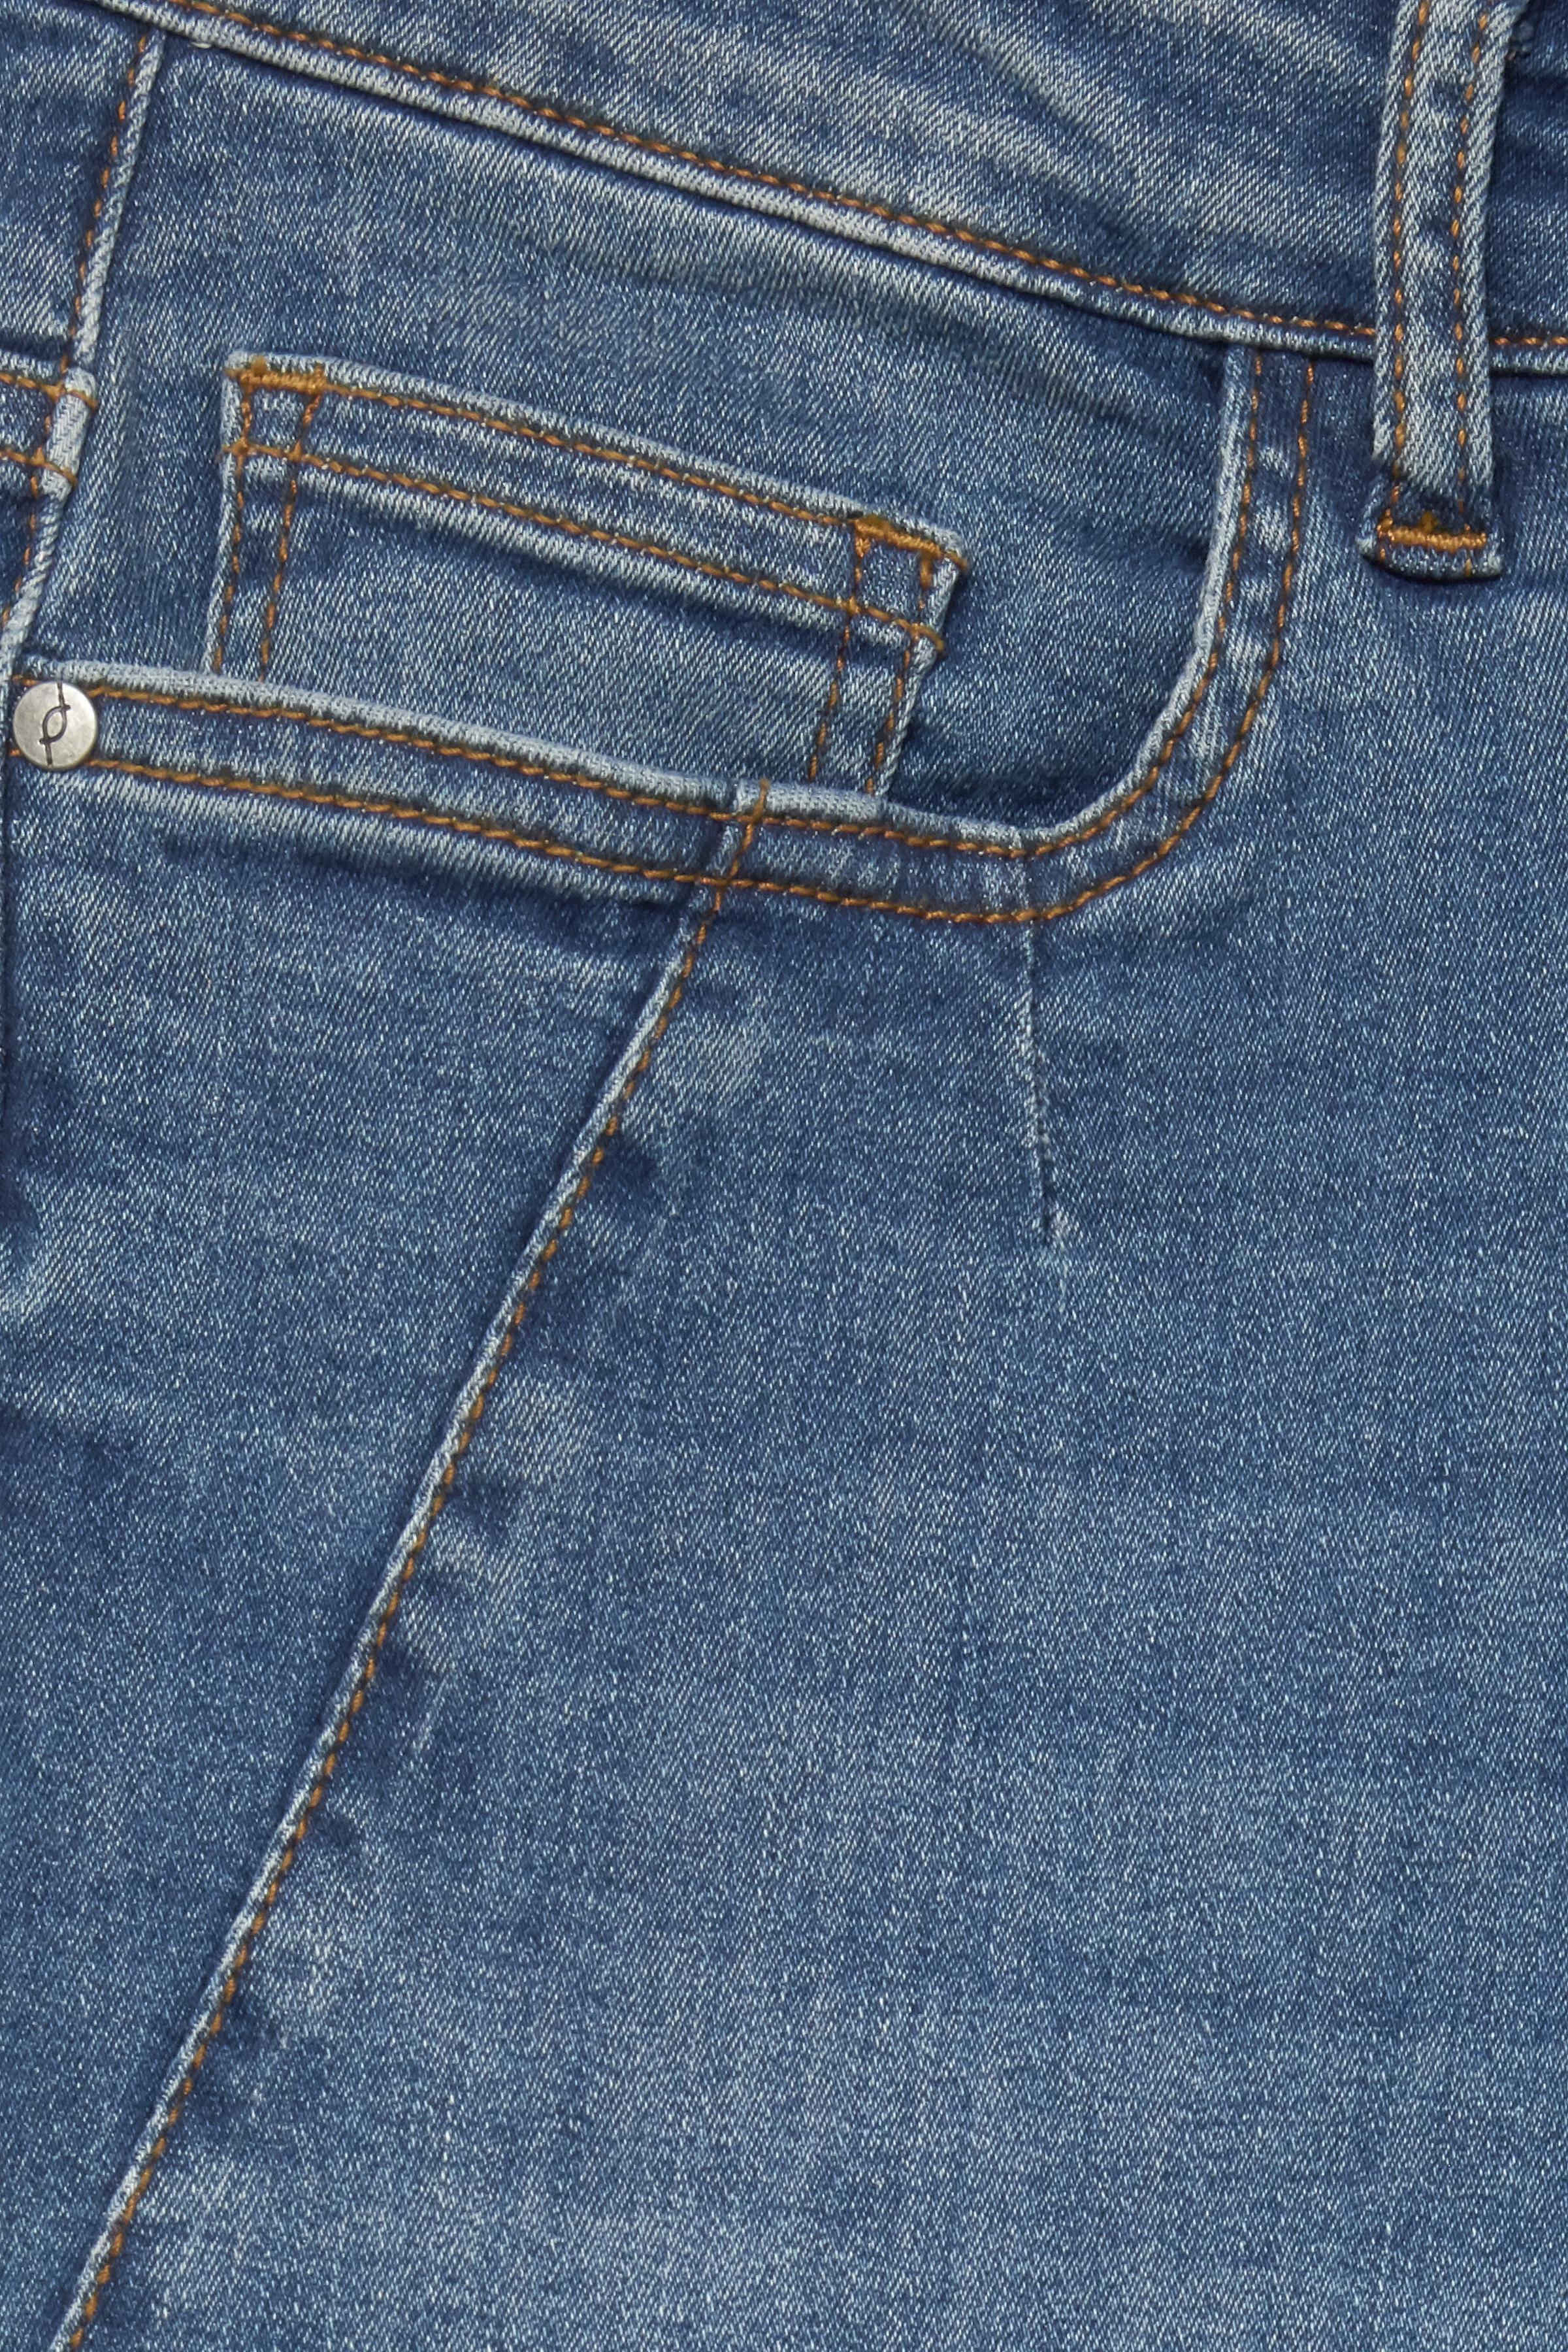 Denimblau Denimhose von Fransa – Shoppen Sie Denimblau Denimhose ab Gr. 34-46 hier